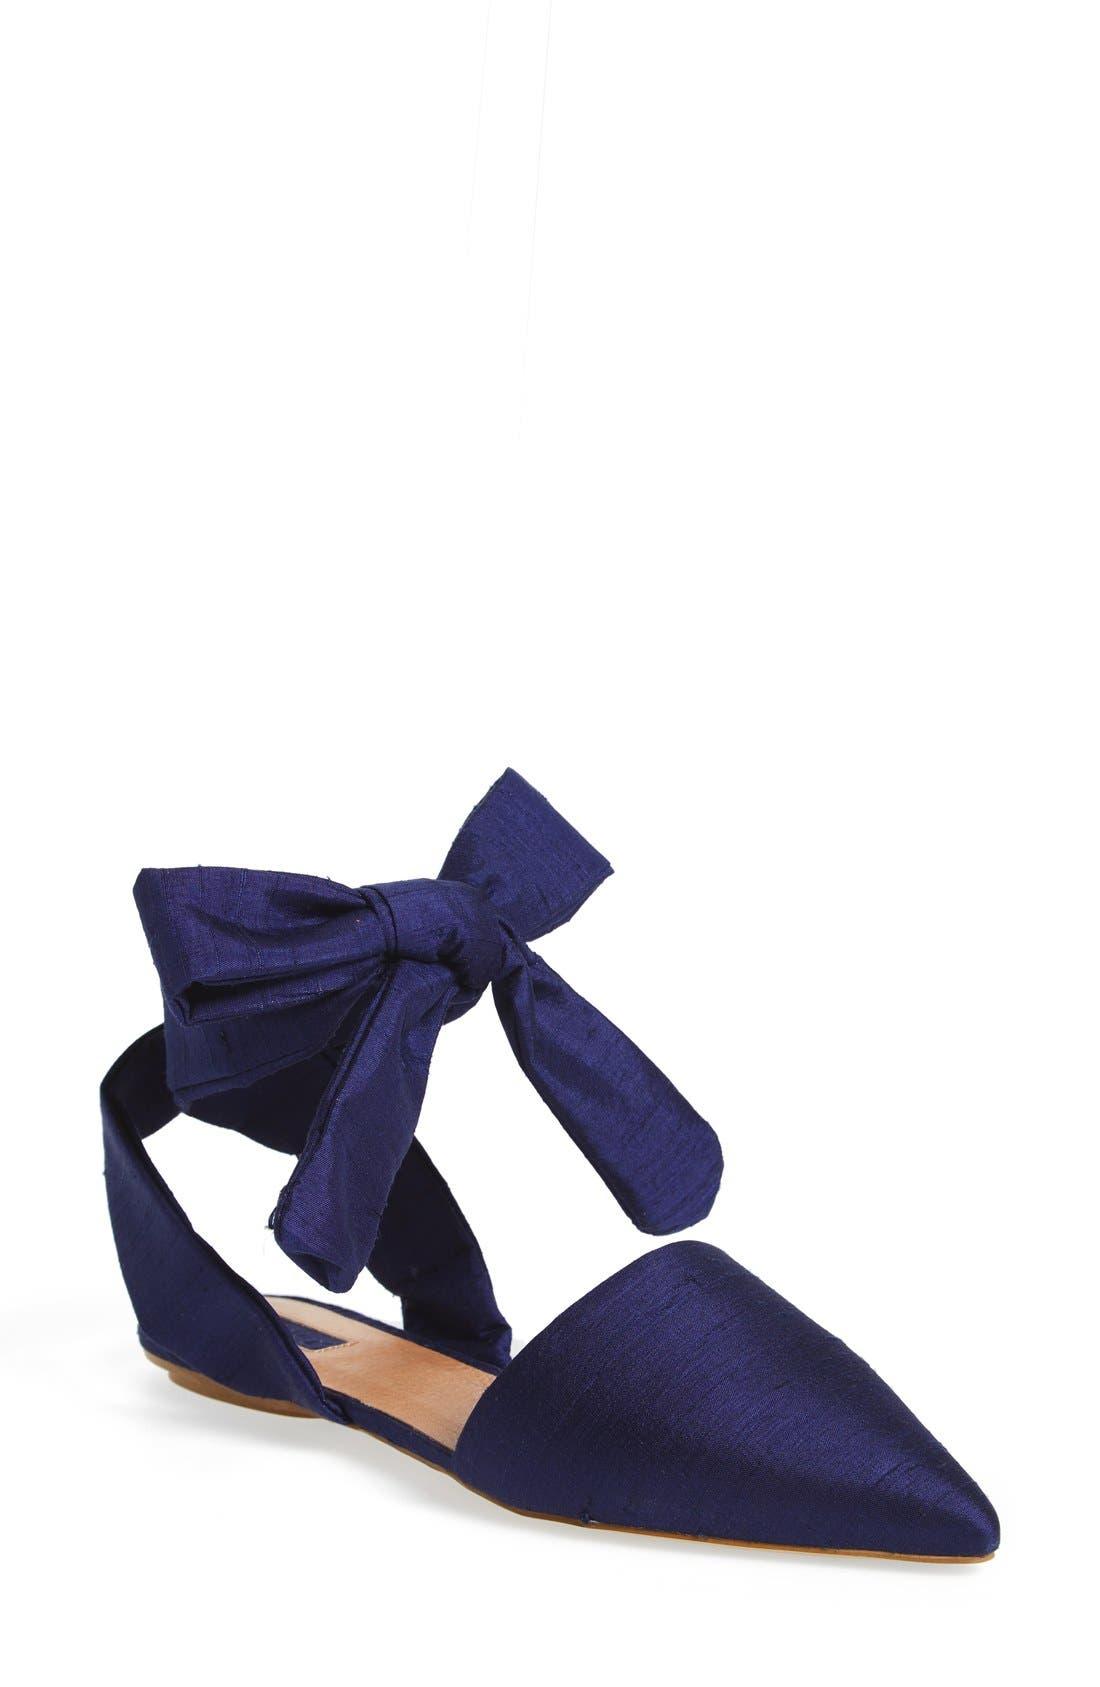 Alternate Image 1 Selected - Topshop 'Khloe' Pointy Toe Flat (Women)